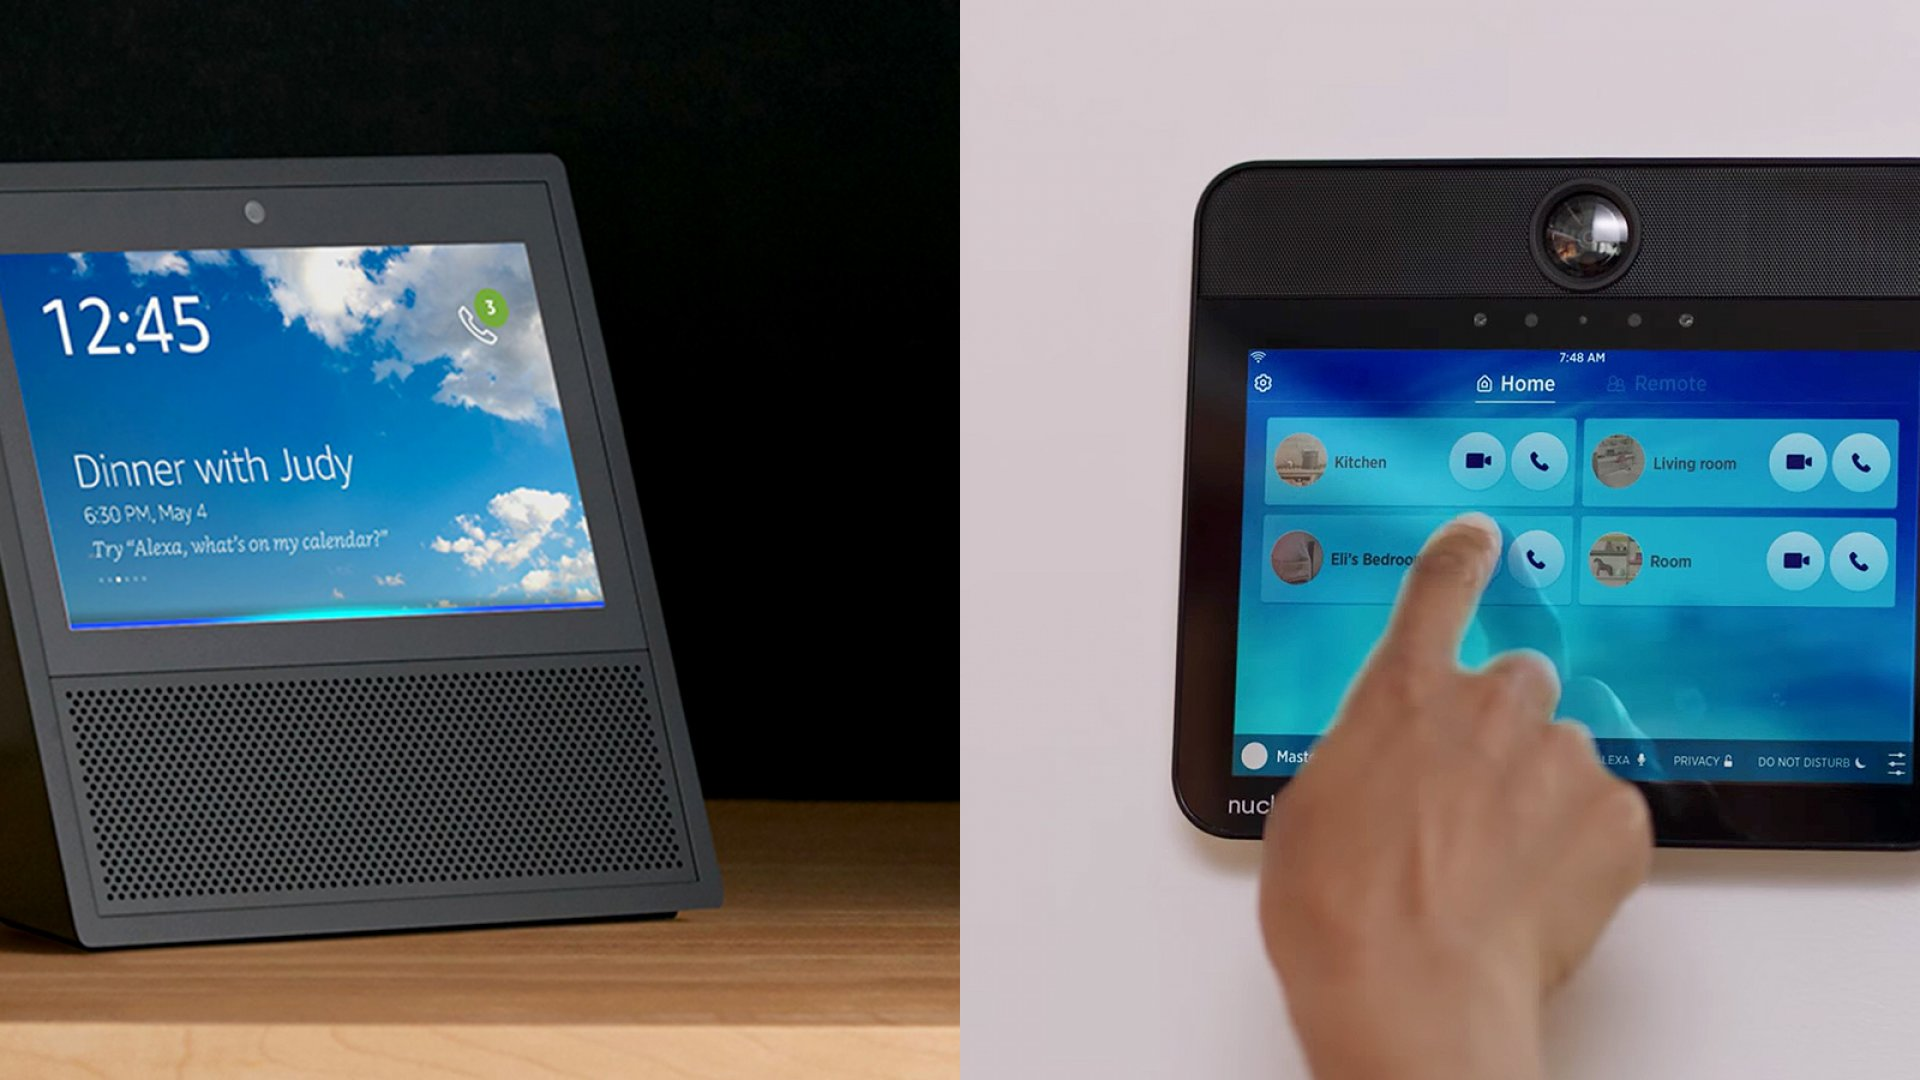 Amazon's Echo Show (left) and the Nucleus Intercom.